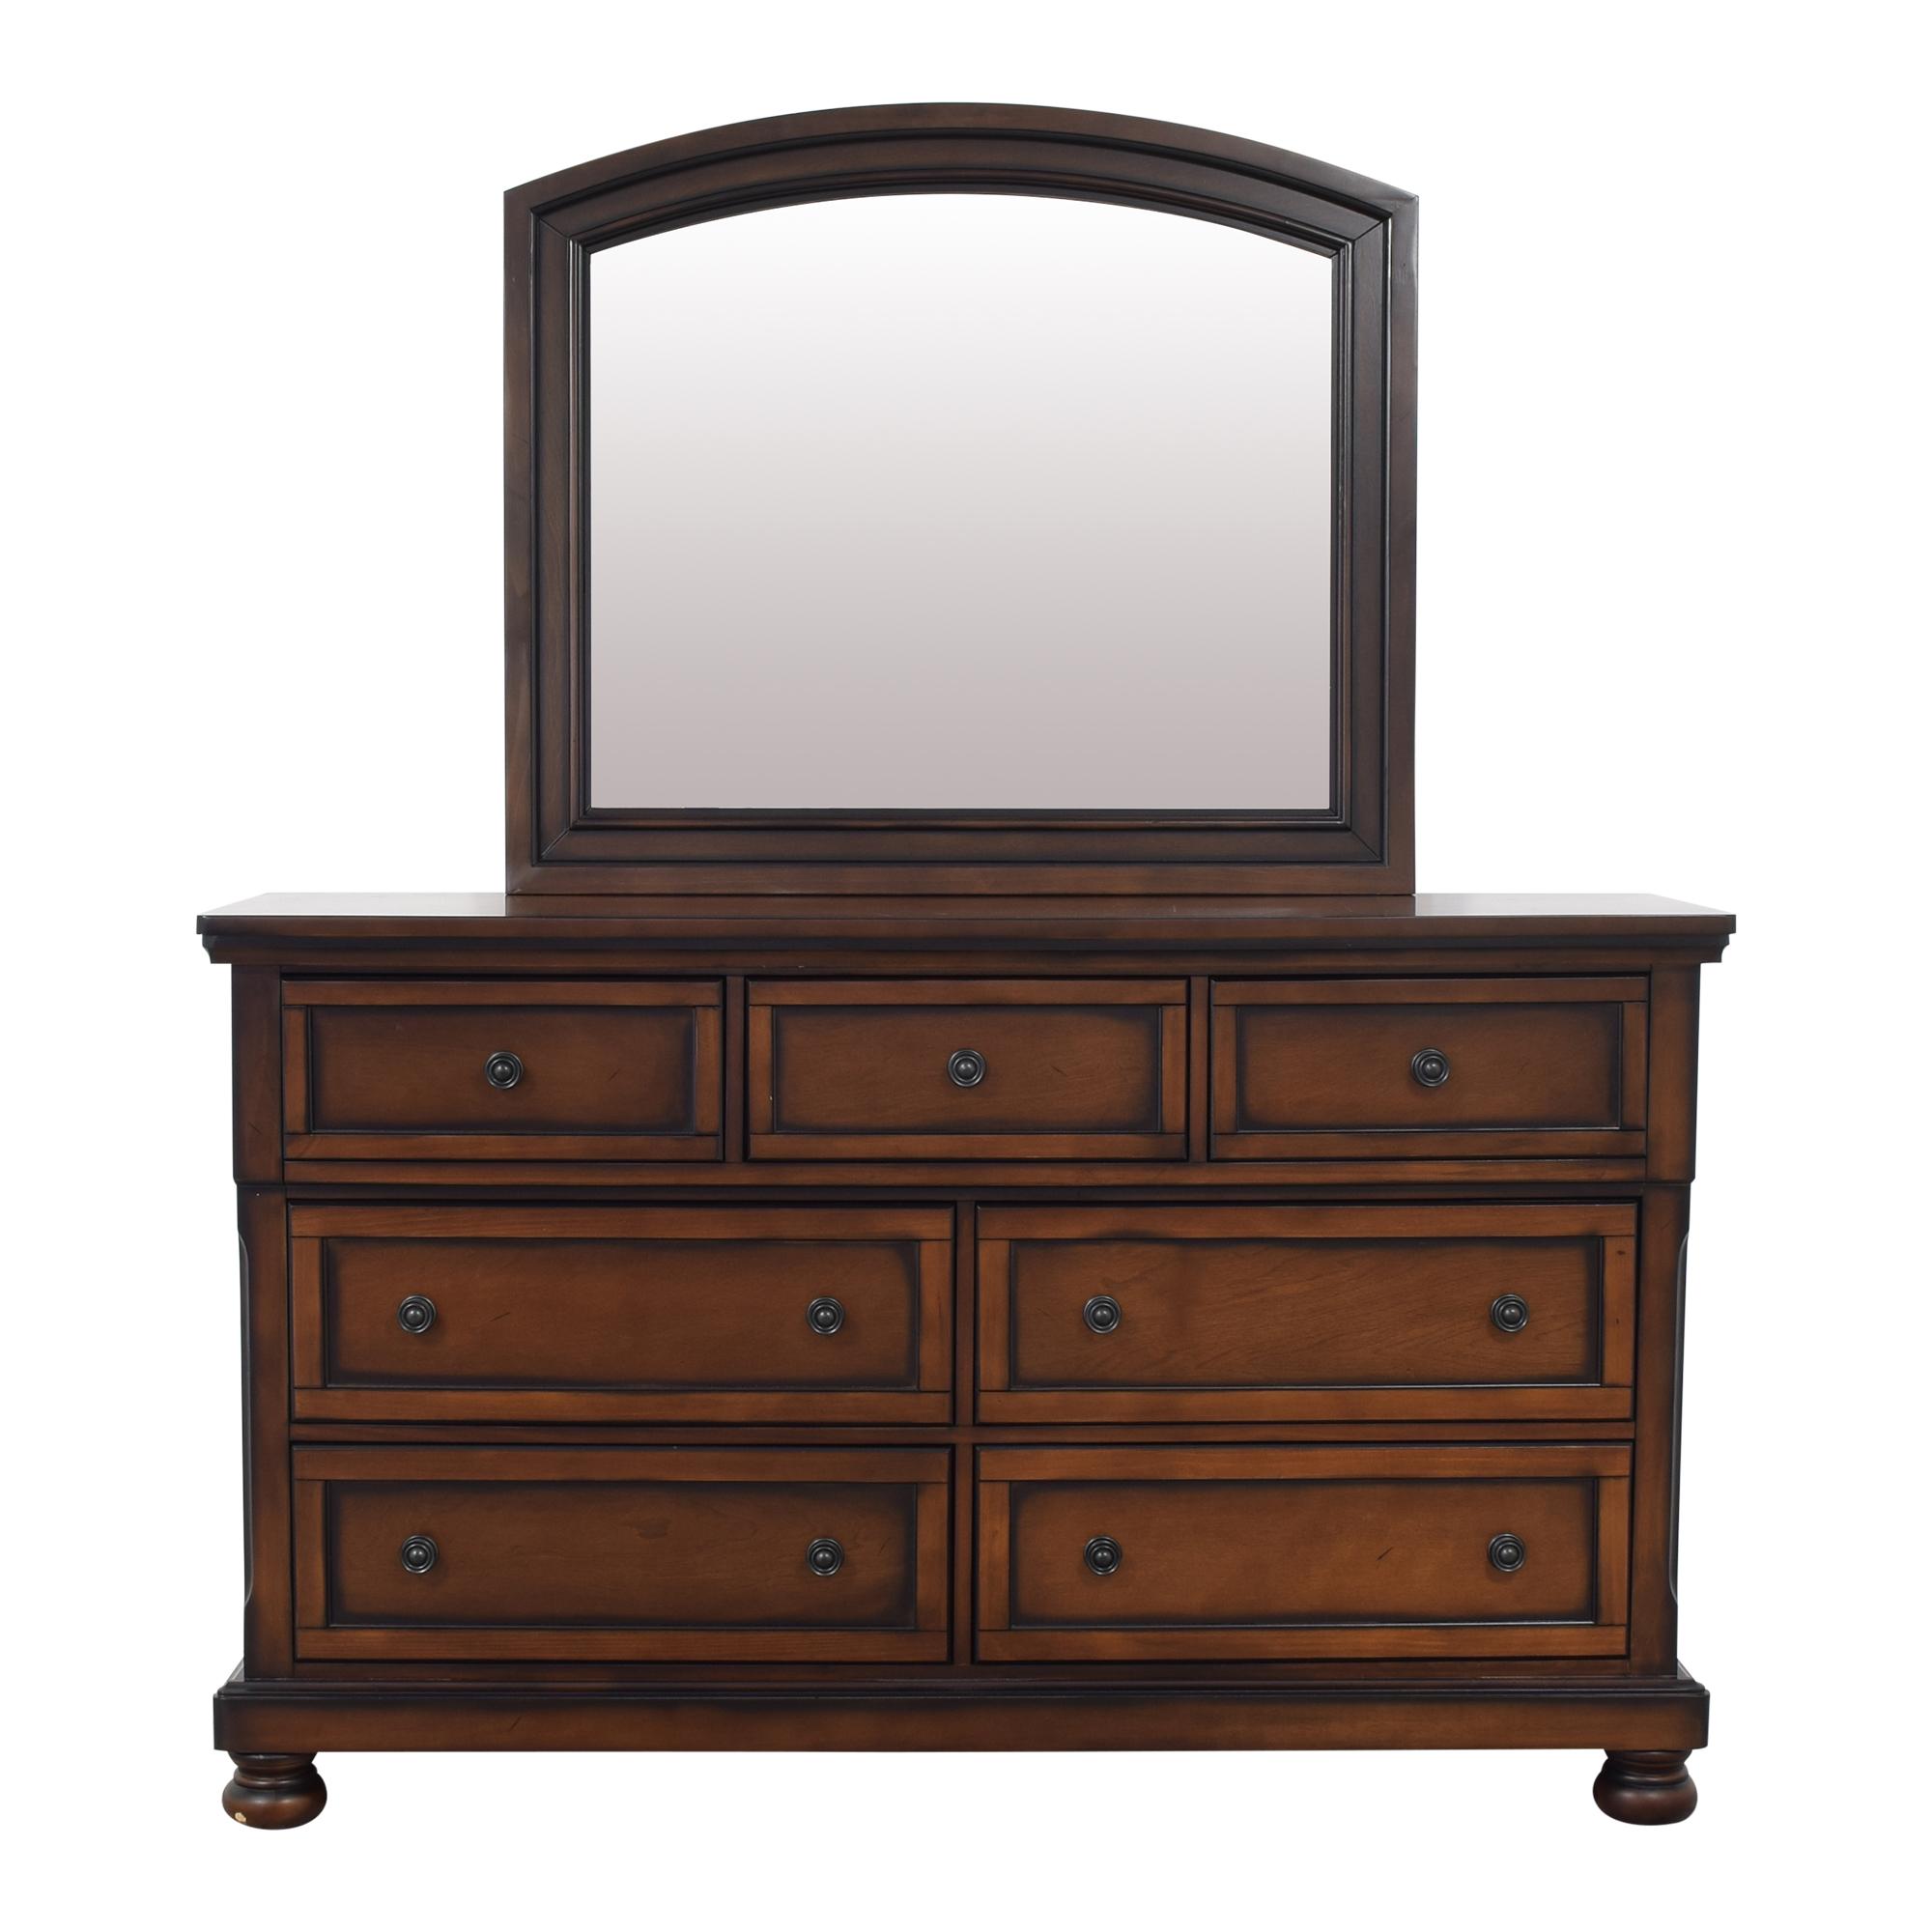 Raymour & Flanigan Raymour & Flanigan Donegan Dresser and Mirror price